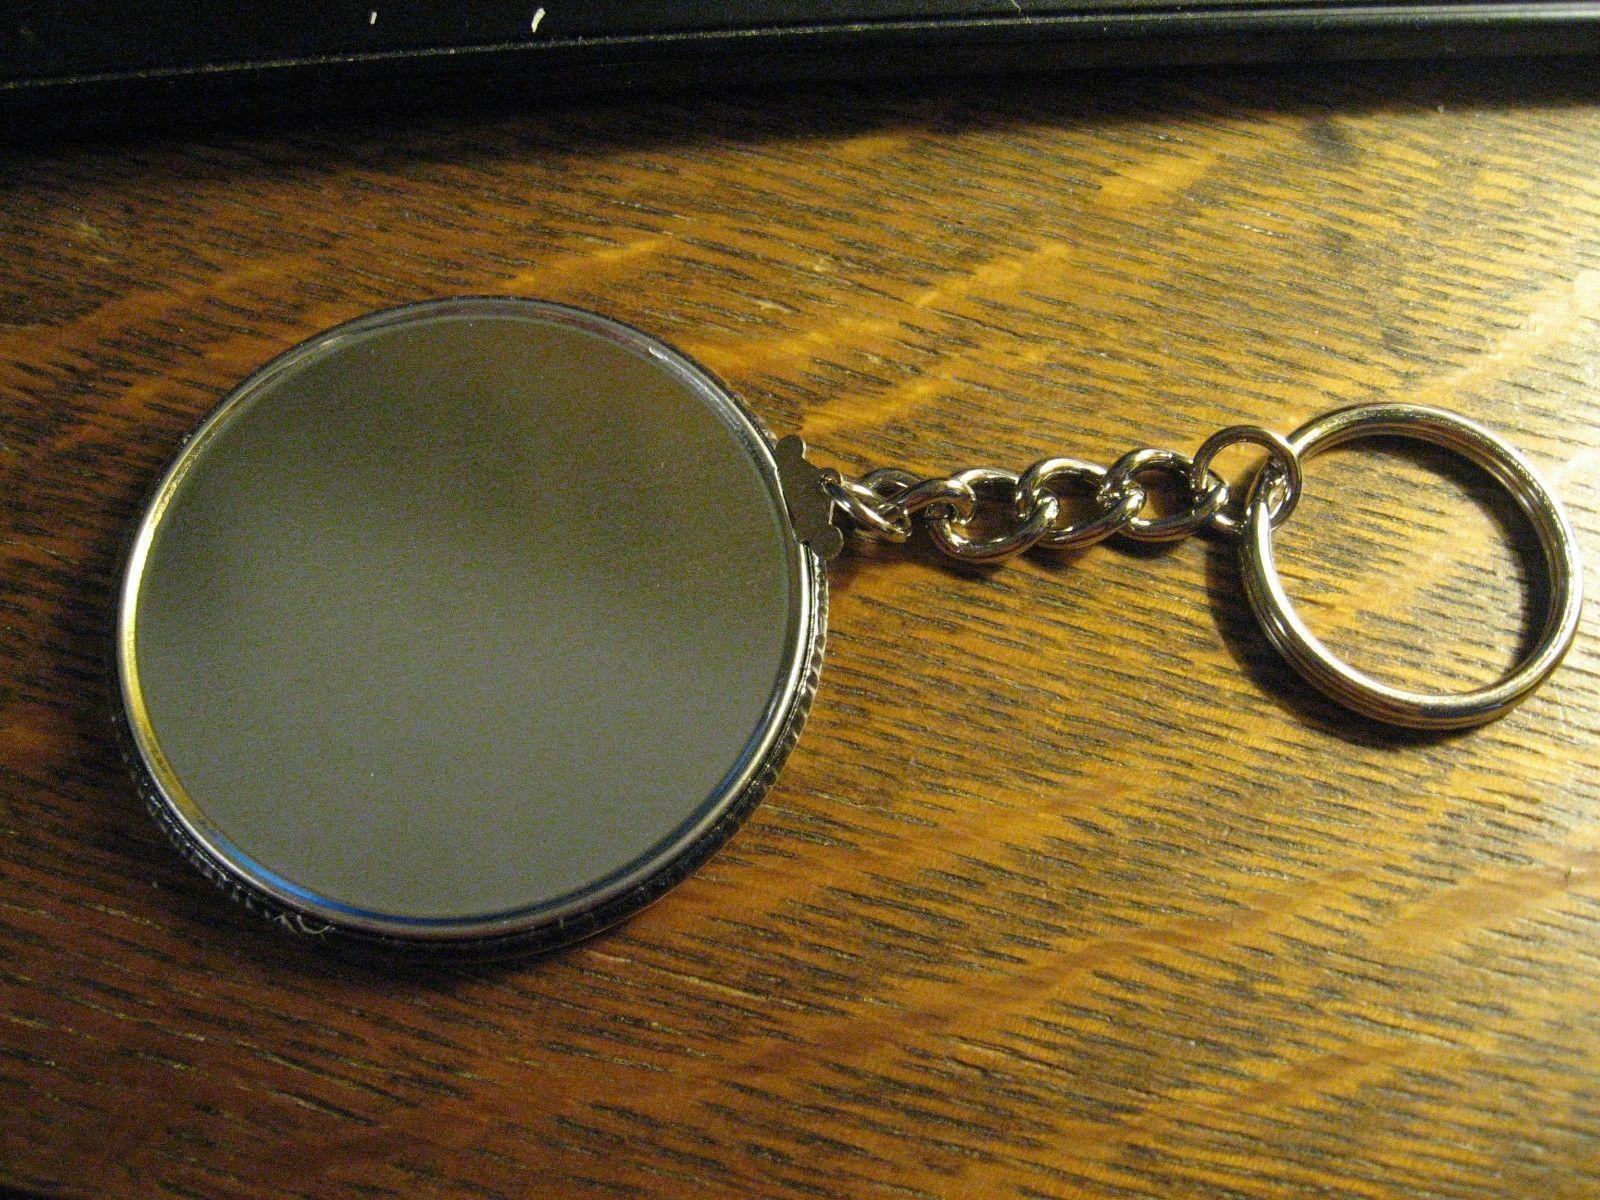 Bulova Watch Logo Keychain - Repurposed Magazine Ad Backpack Purse Clip Ornament